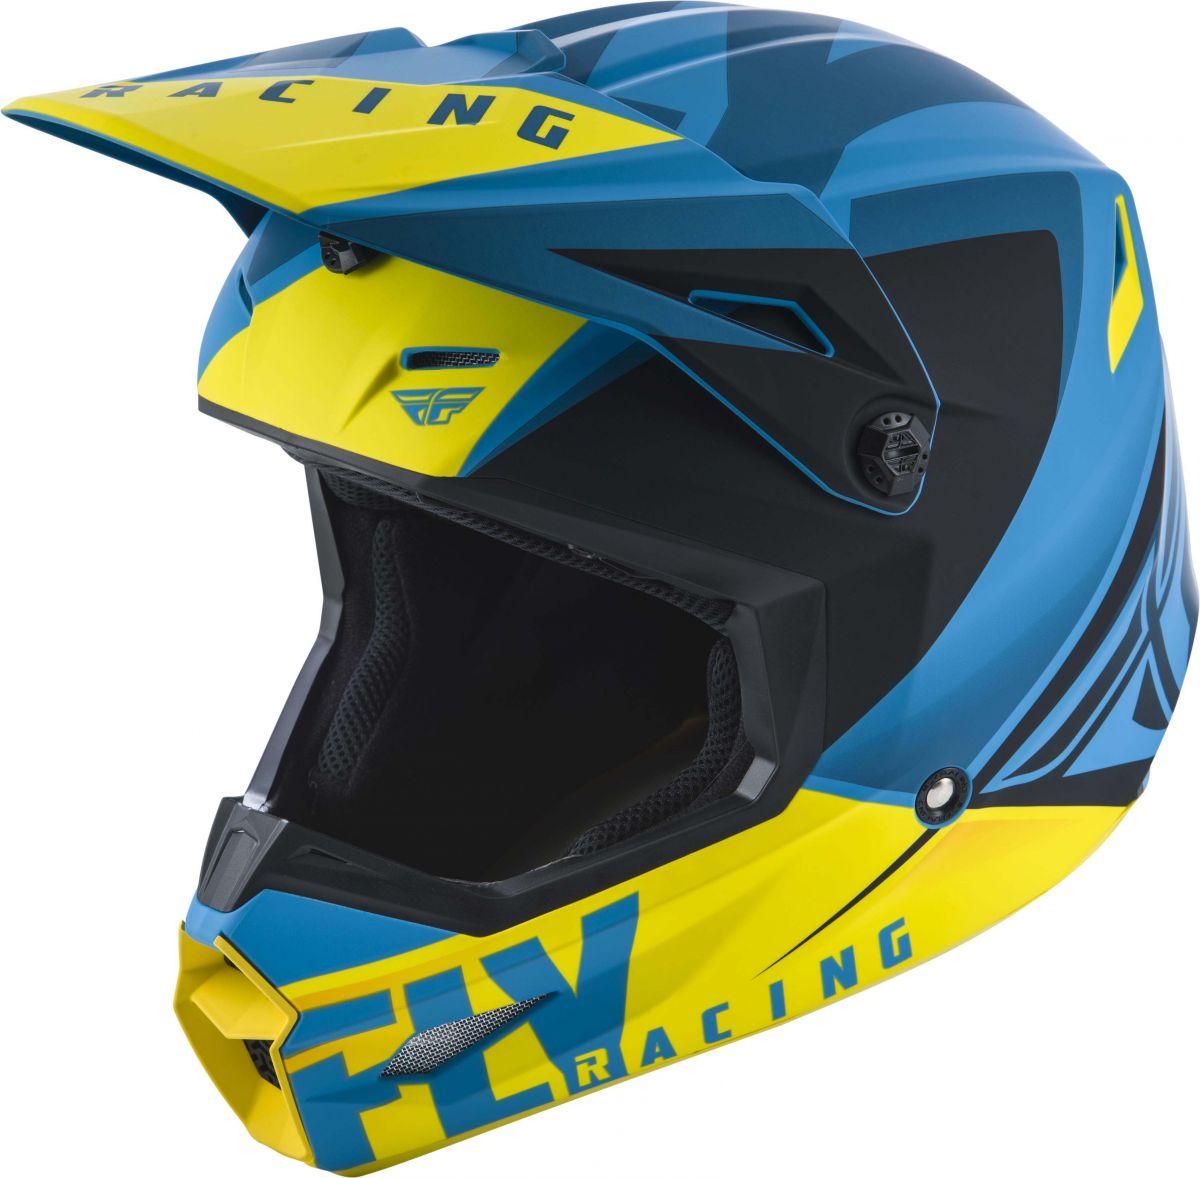 Fly - 2019 Elite Vigilant Blue/Black шлем, сине-черно-желтый